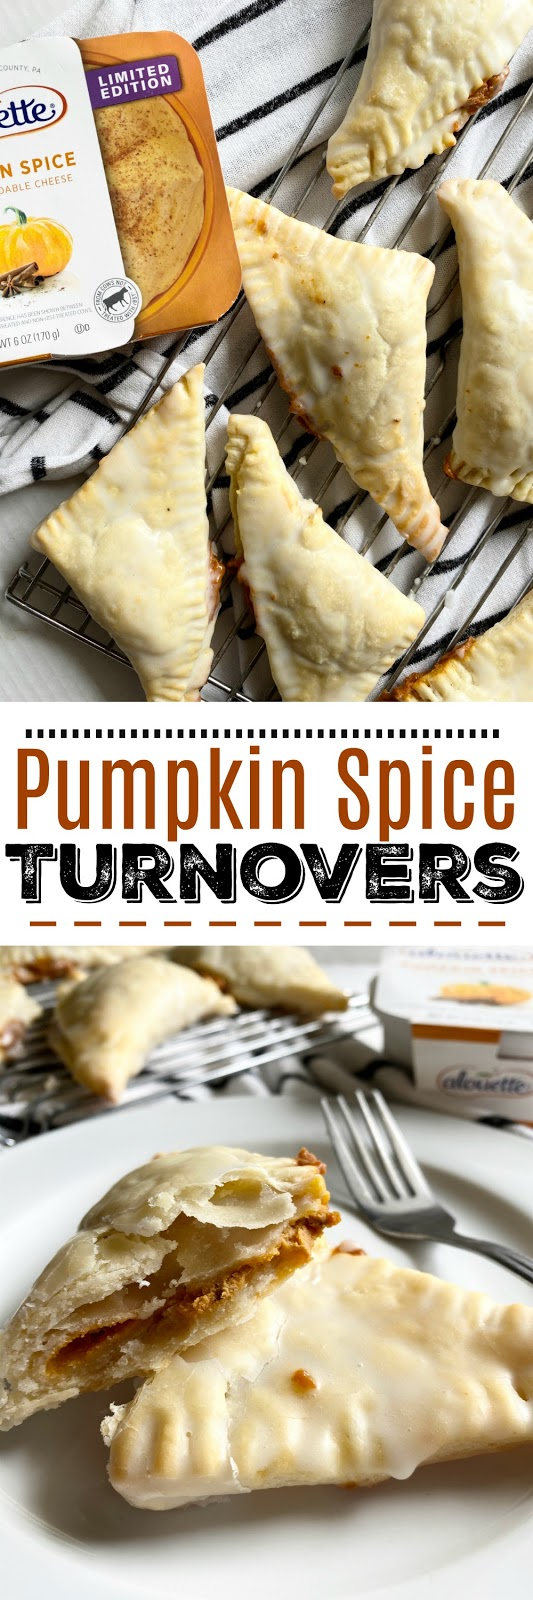 pumpkin spice turnovers #pumpkinspice #alouette #turnovers